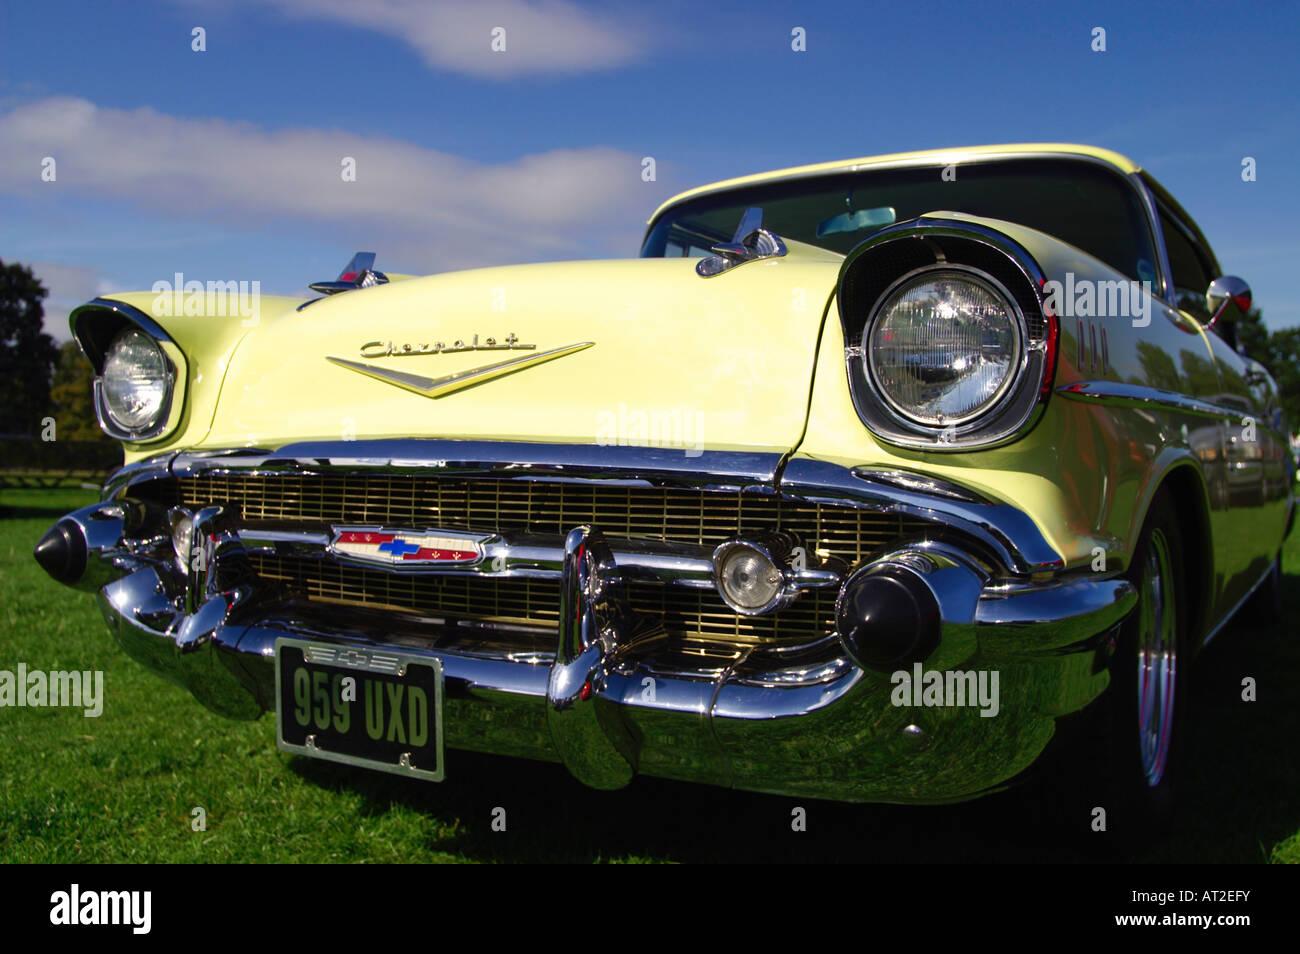 1957 Chevrolet Bel Air 2 Door Sedan American Classic Car Stock Photo Chevy